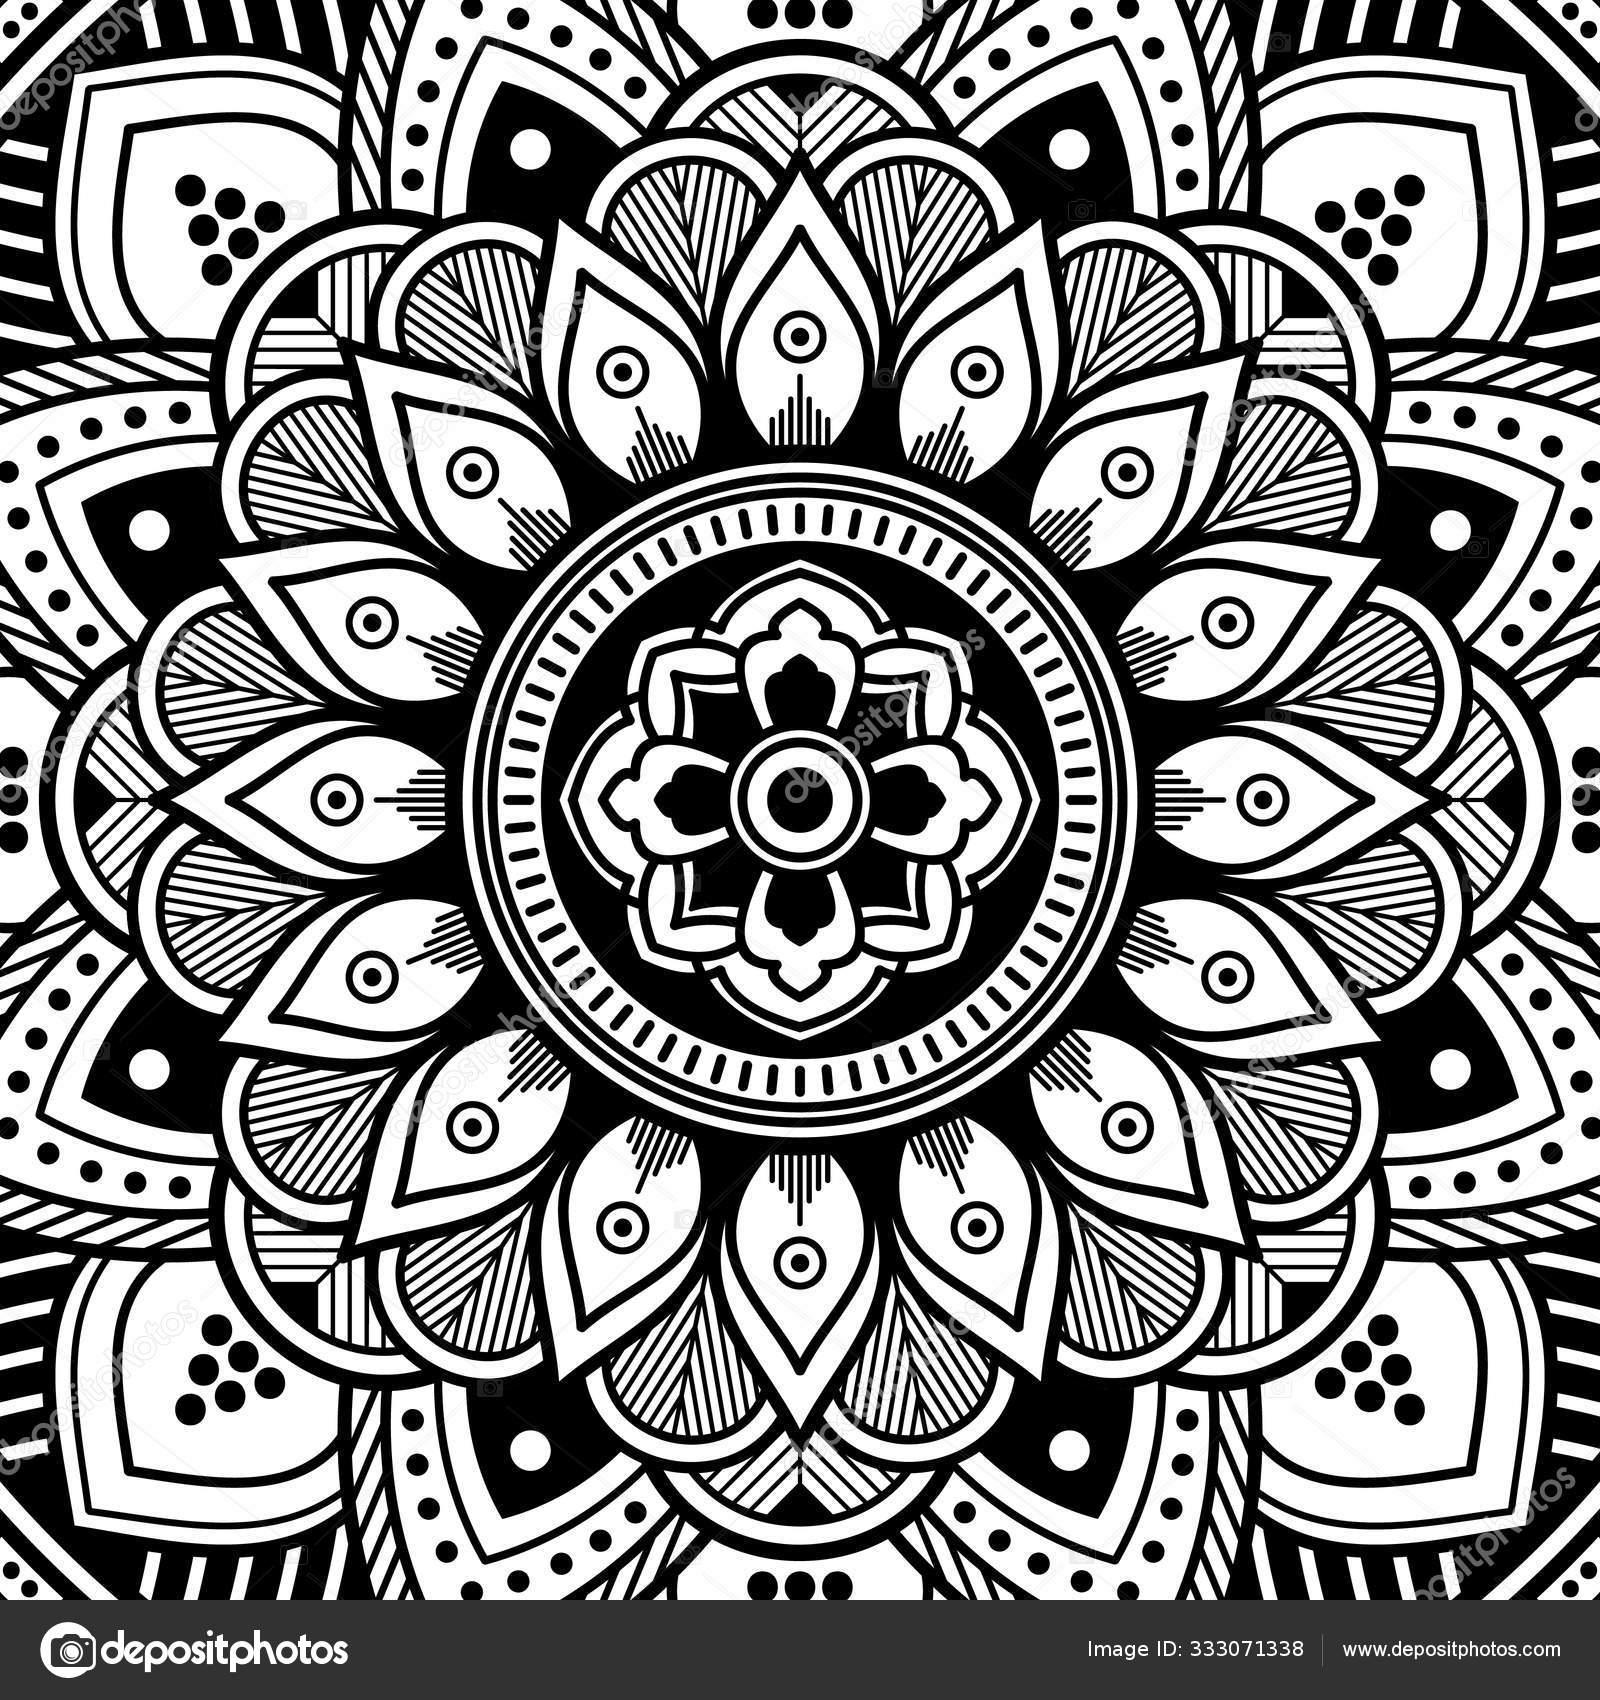 Mandala Pattern Black White Decorative Ornament Stress Therapy Patterns Vector Image By C Urban 4k Web Gmail Com Stock 333071338